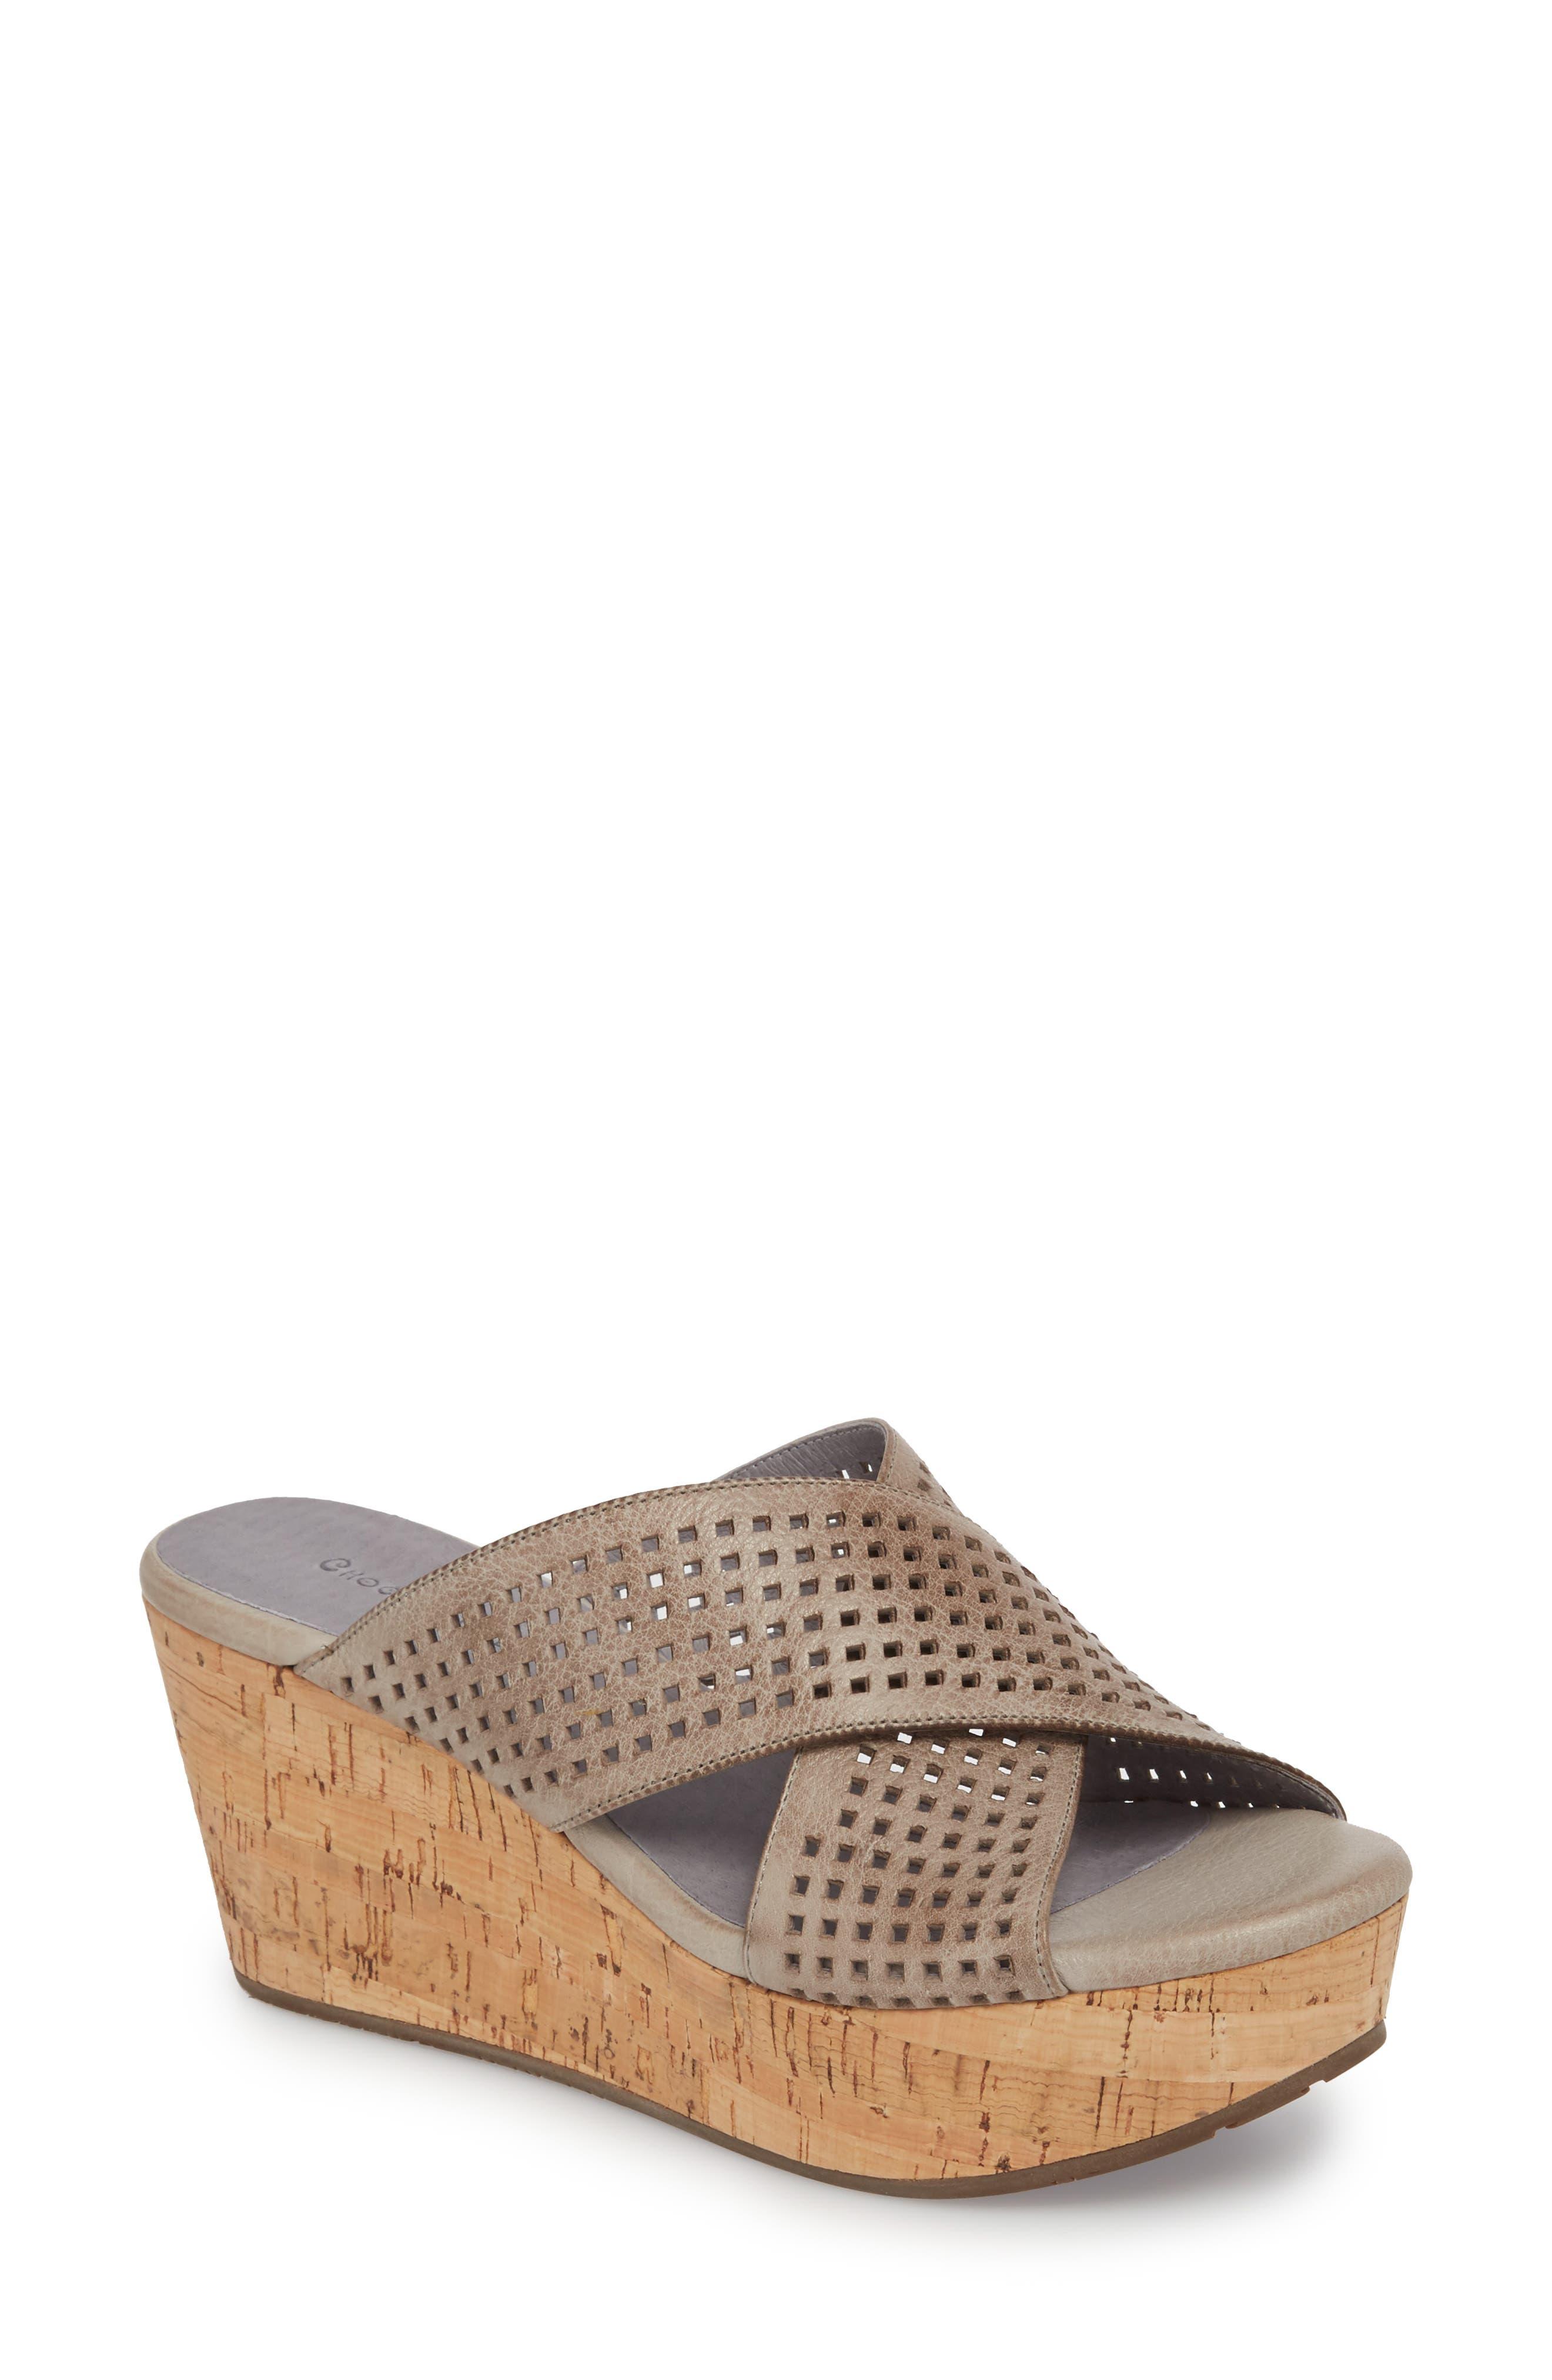 Wamblee Wedge Sandal,                         Main,                         color, 038